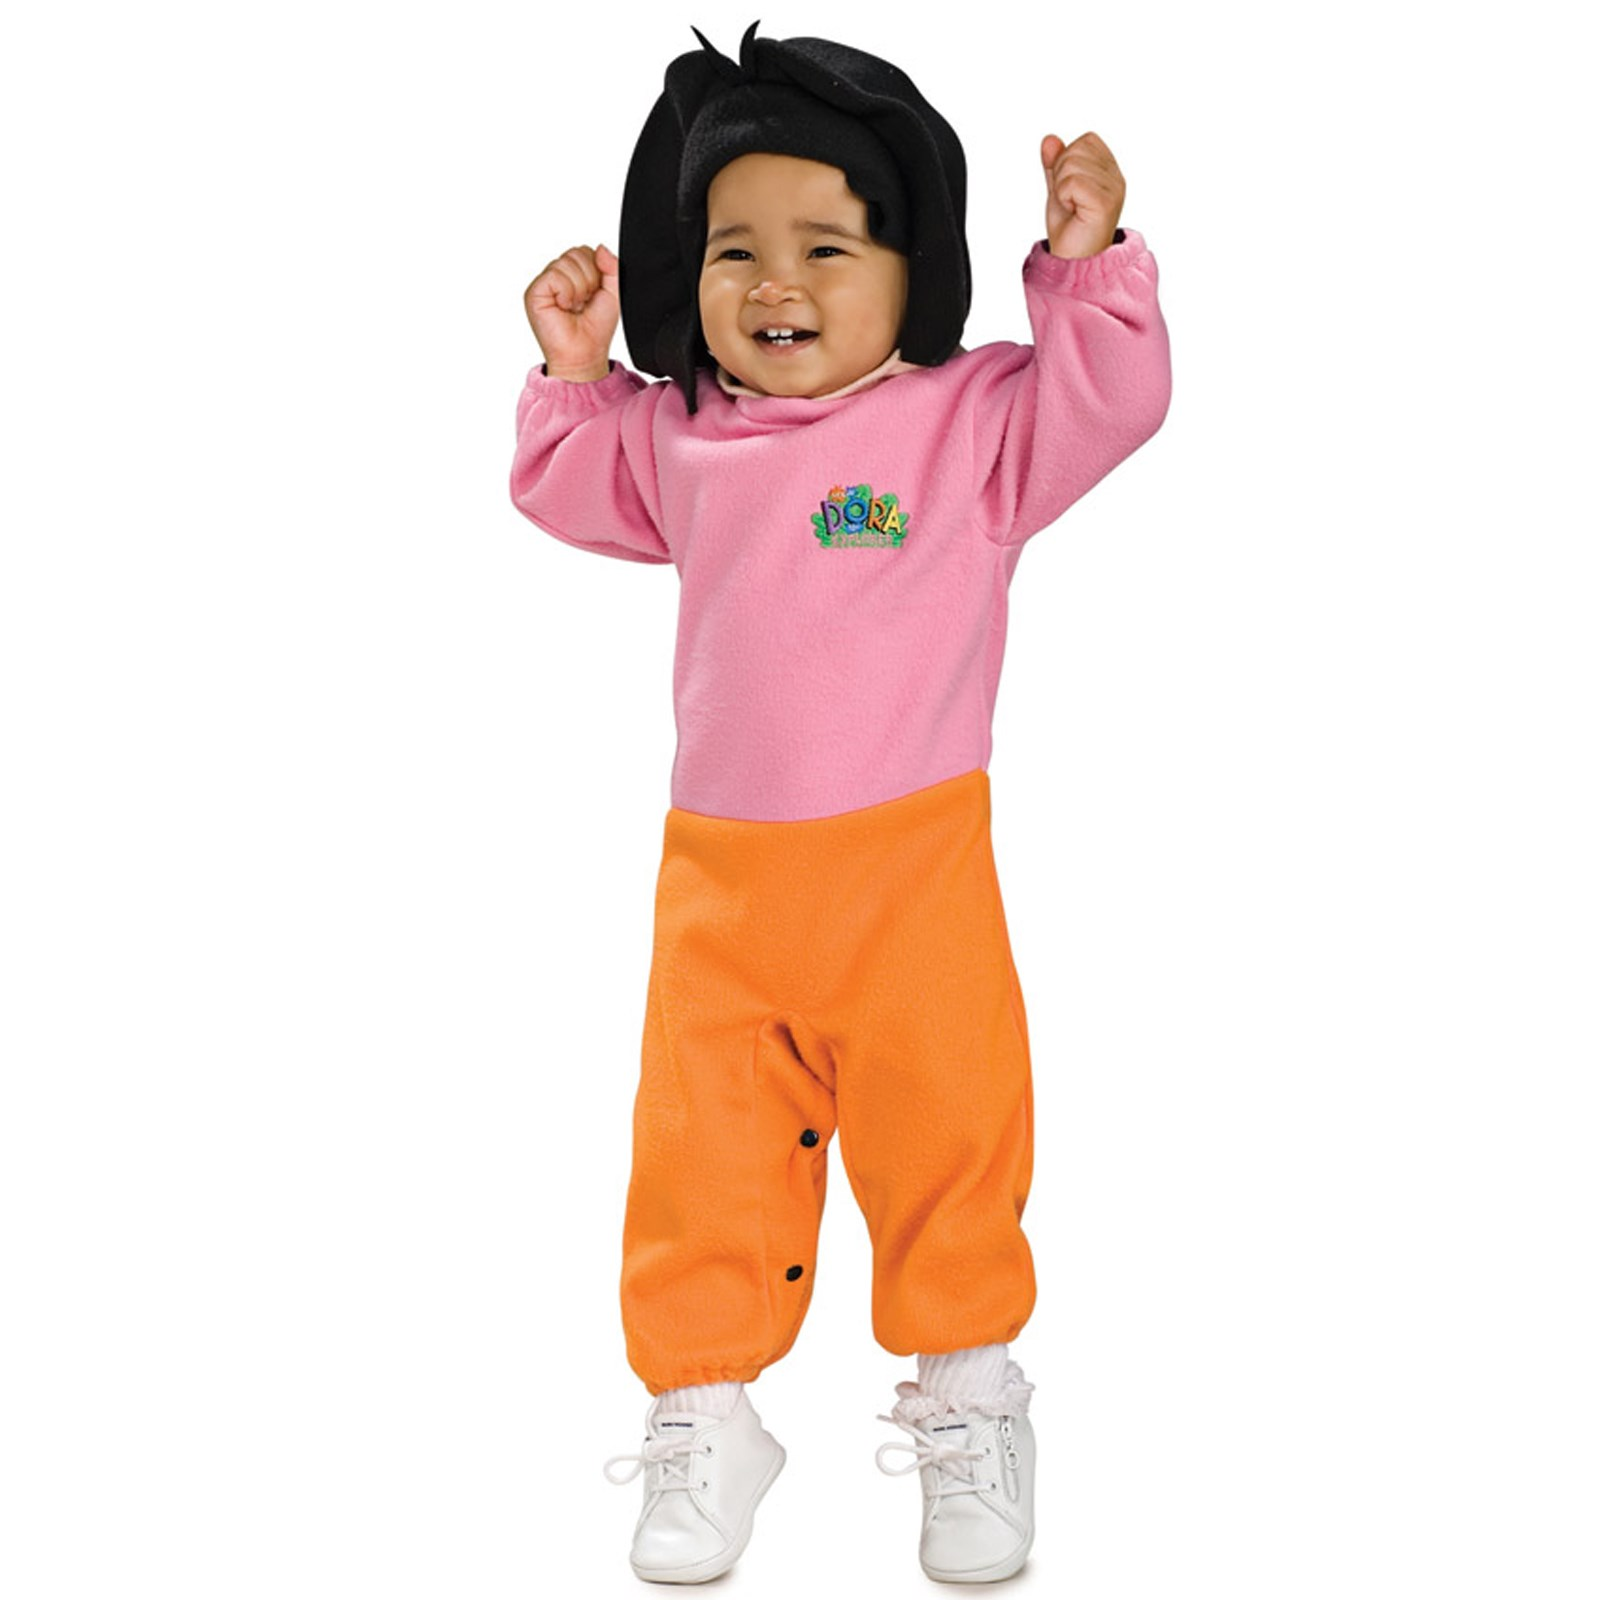 Dora The Explorer Dora EZ-On Romper Infant Costume | BuyCostumes.com